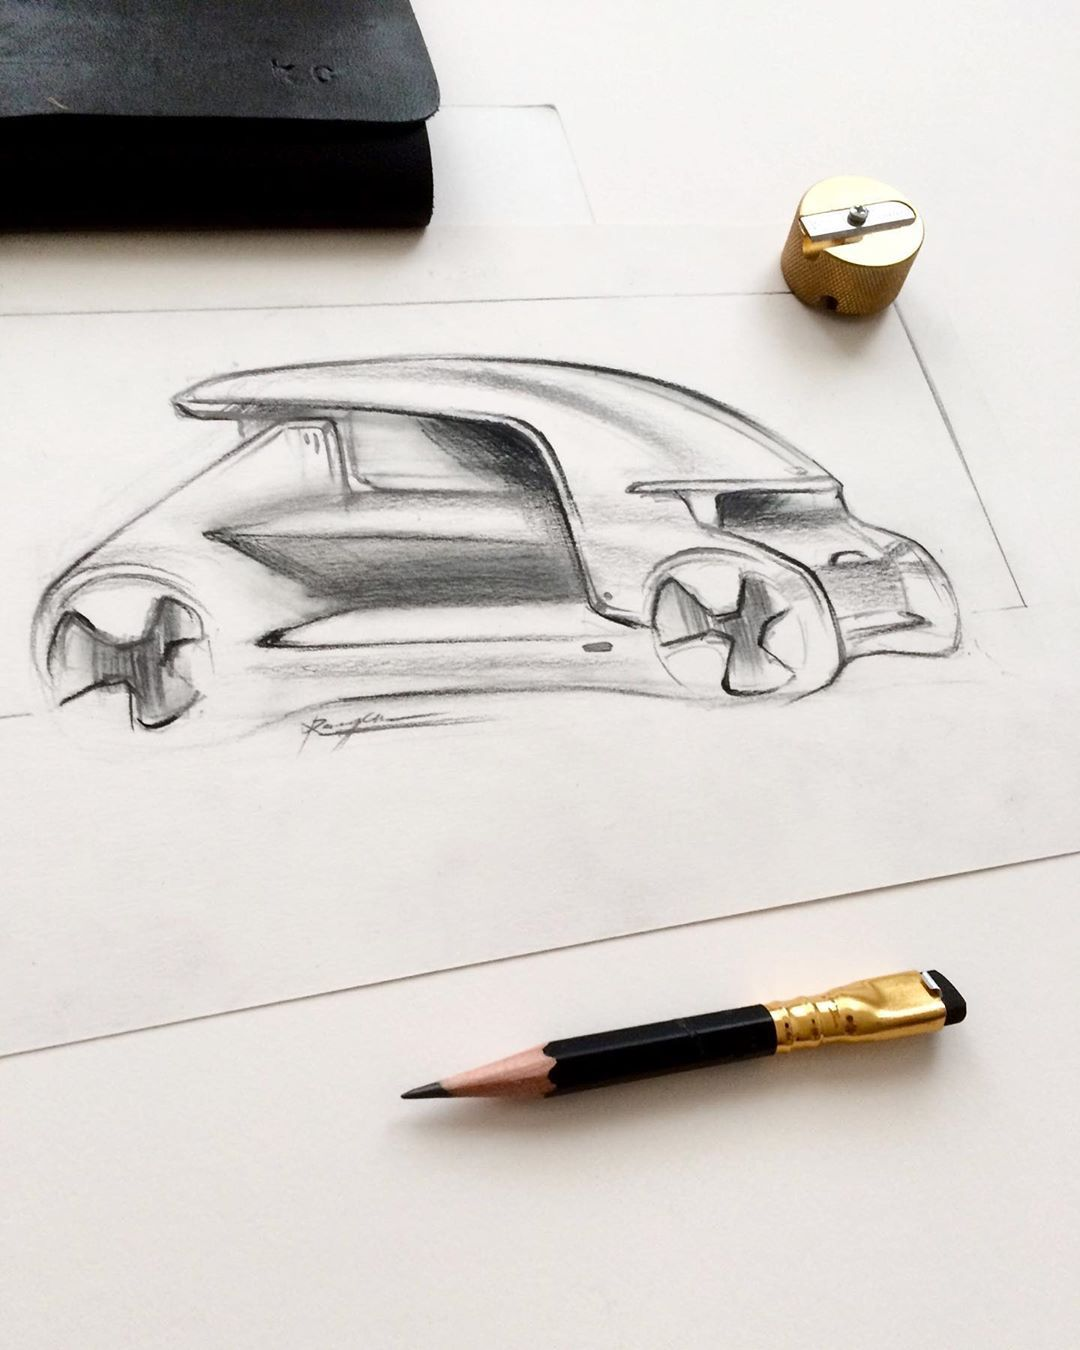 ____ m a j i n . b u u // . . #sketch #doodle #drawing #sketching #creative #conceptart #scifi #futuristic #cyberpunk #designsketch #automotivedesign #cardesign #sketchbook #cardesignworld #cardesignsketch #cardesigndaily #artstationhq #idsketching #sketchaday #sketchstorm #cardesigndaily #cardesigncommunity #cardesignru #cardesignpro #cars #conceptart #concept #sketchbook #productdesign #illustration #pencil #black #gold .